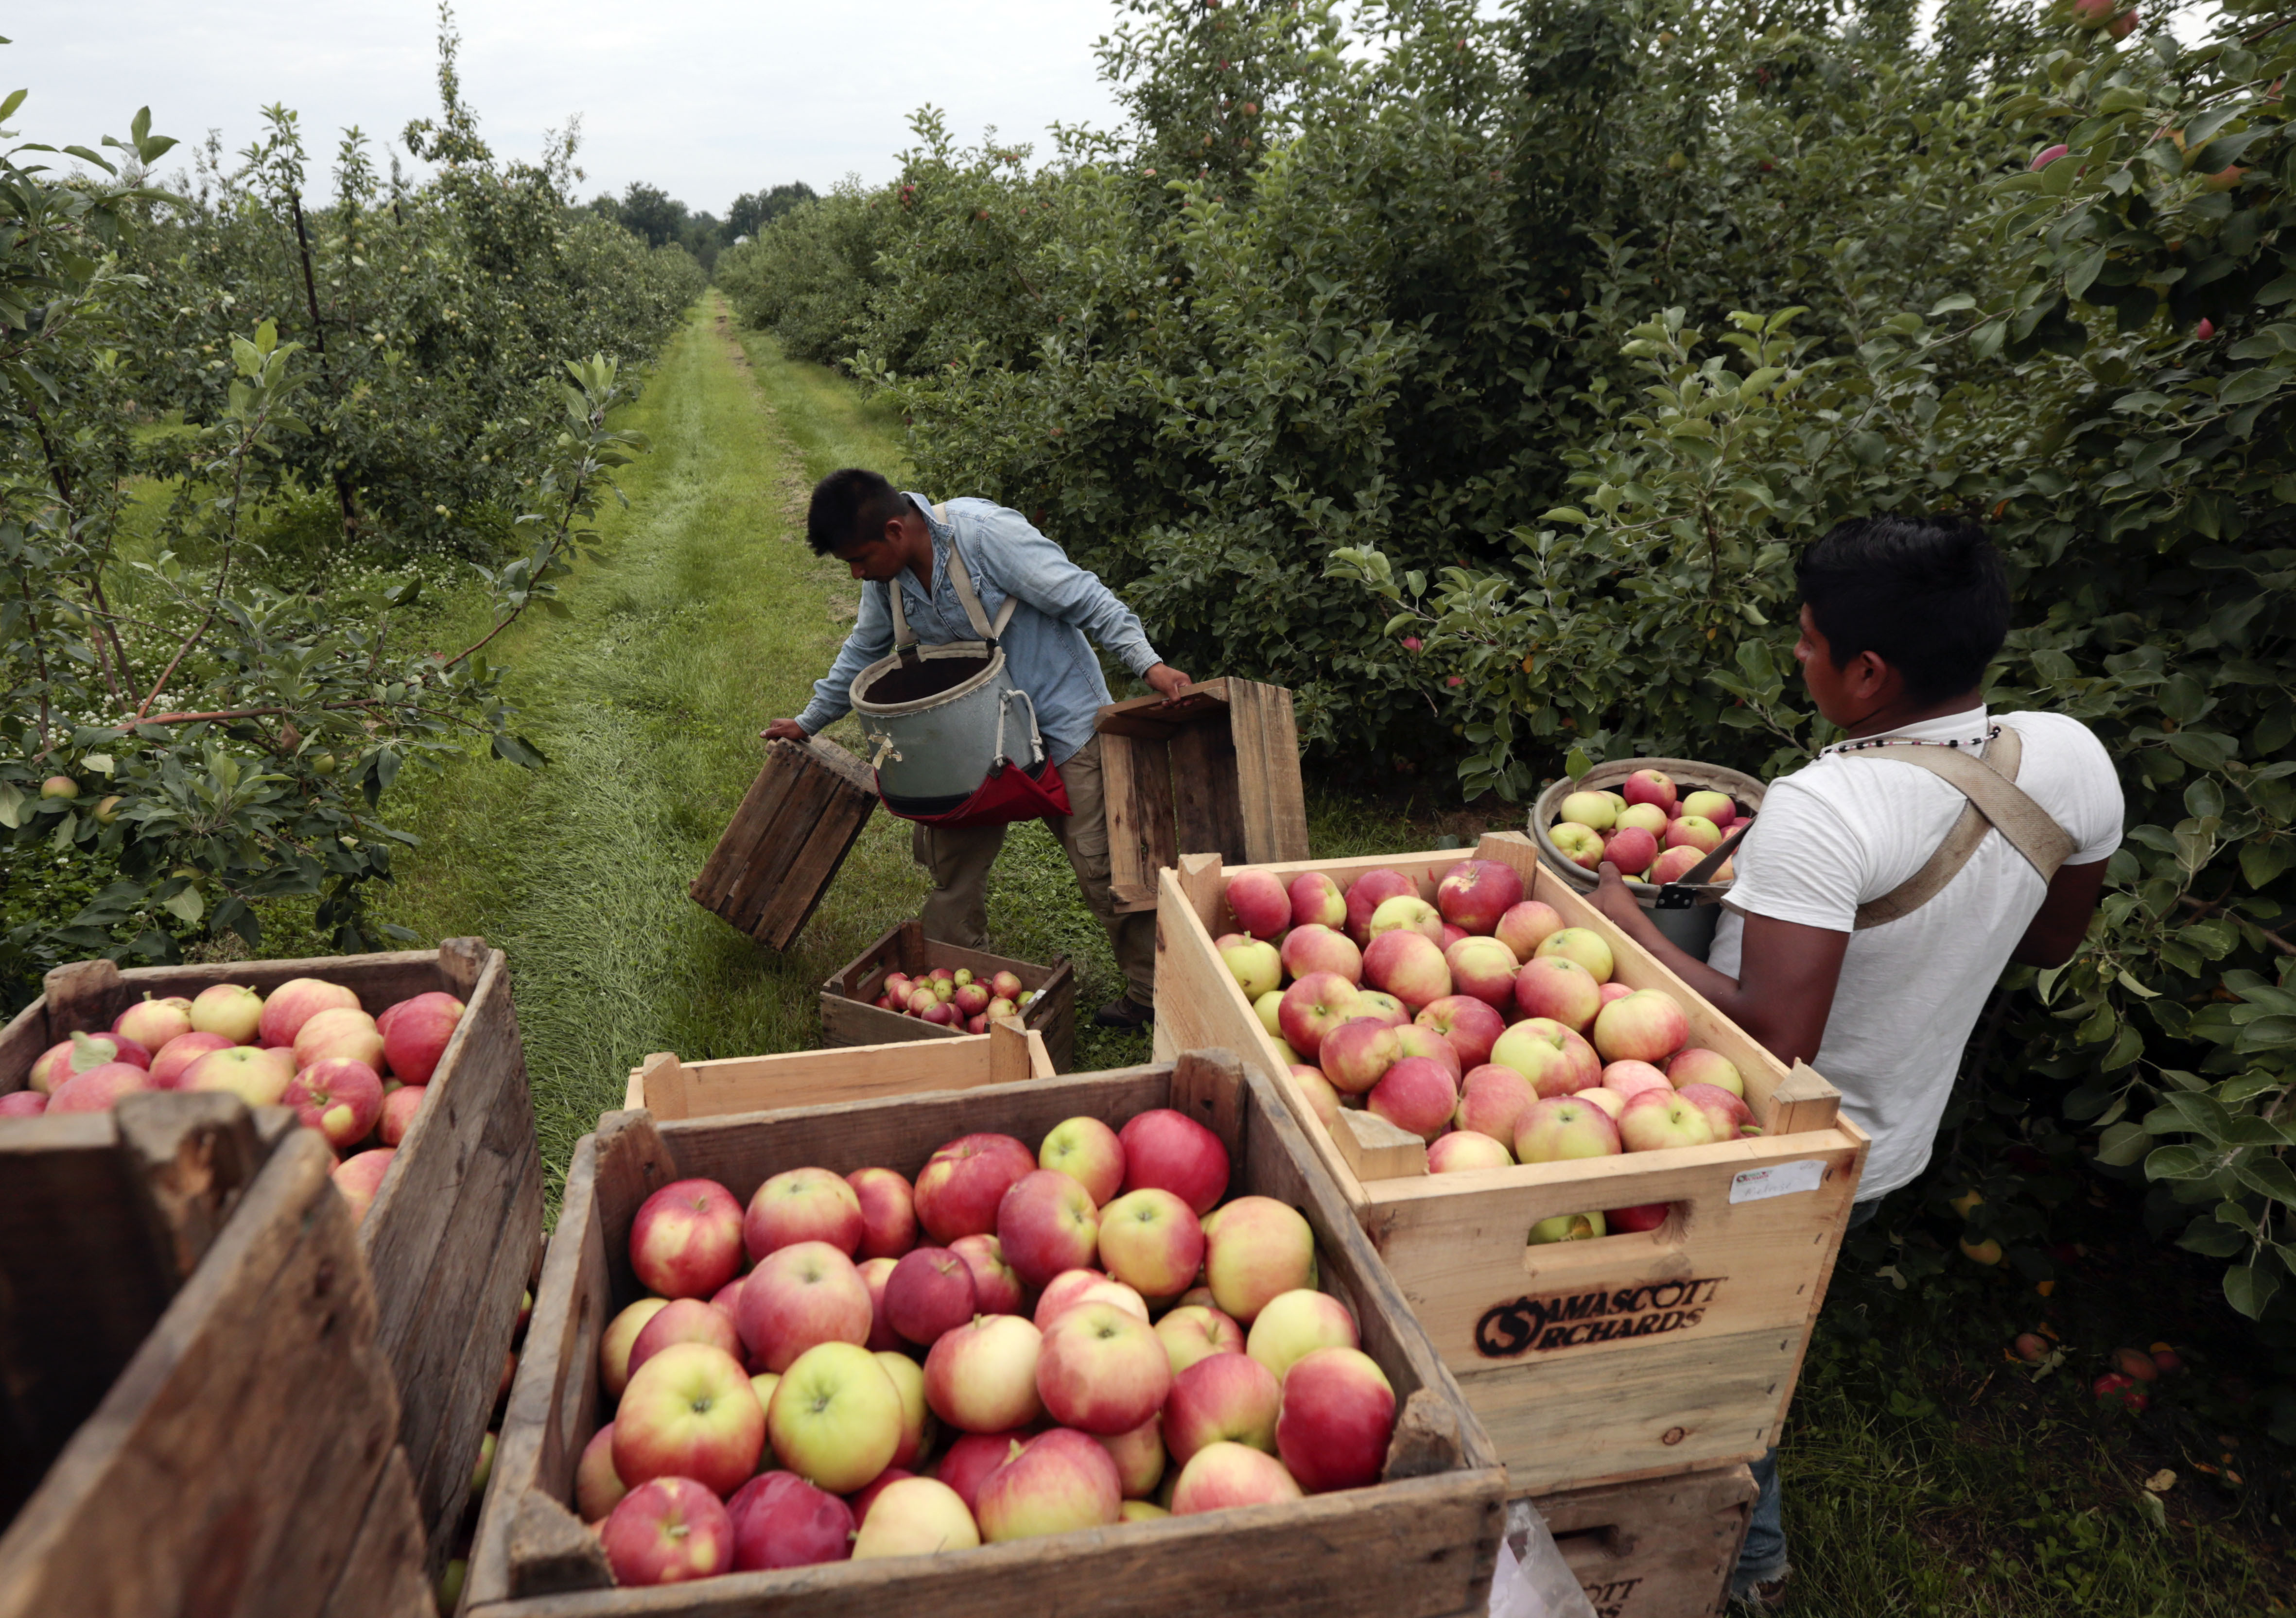 samascott orchards